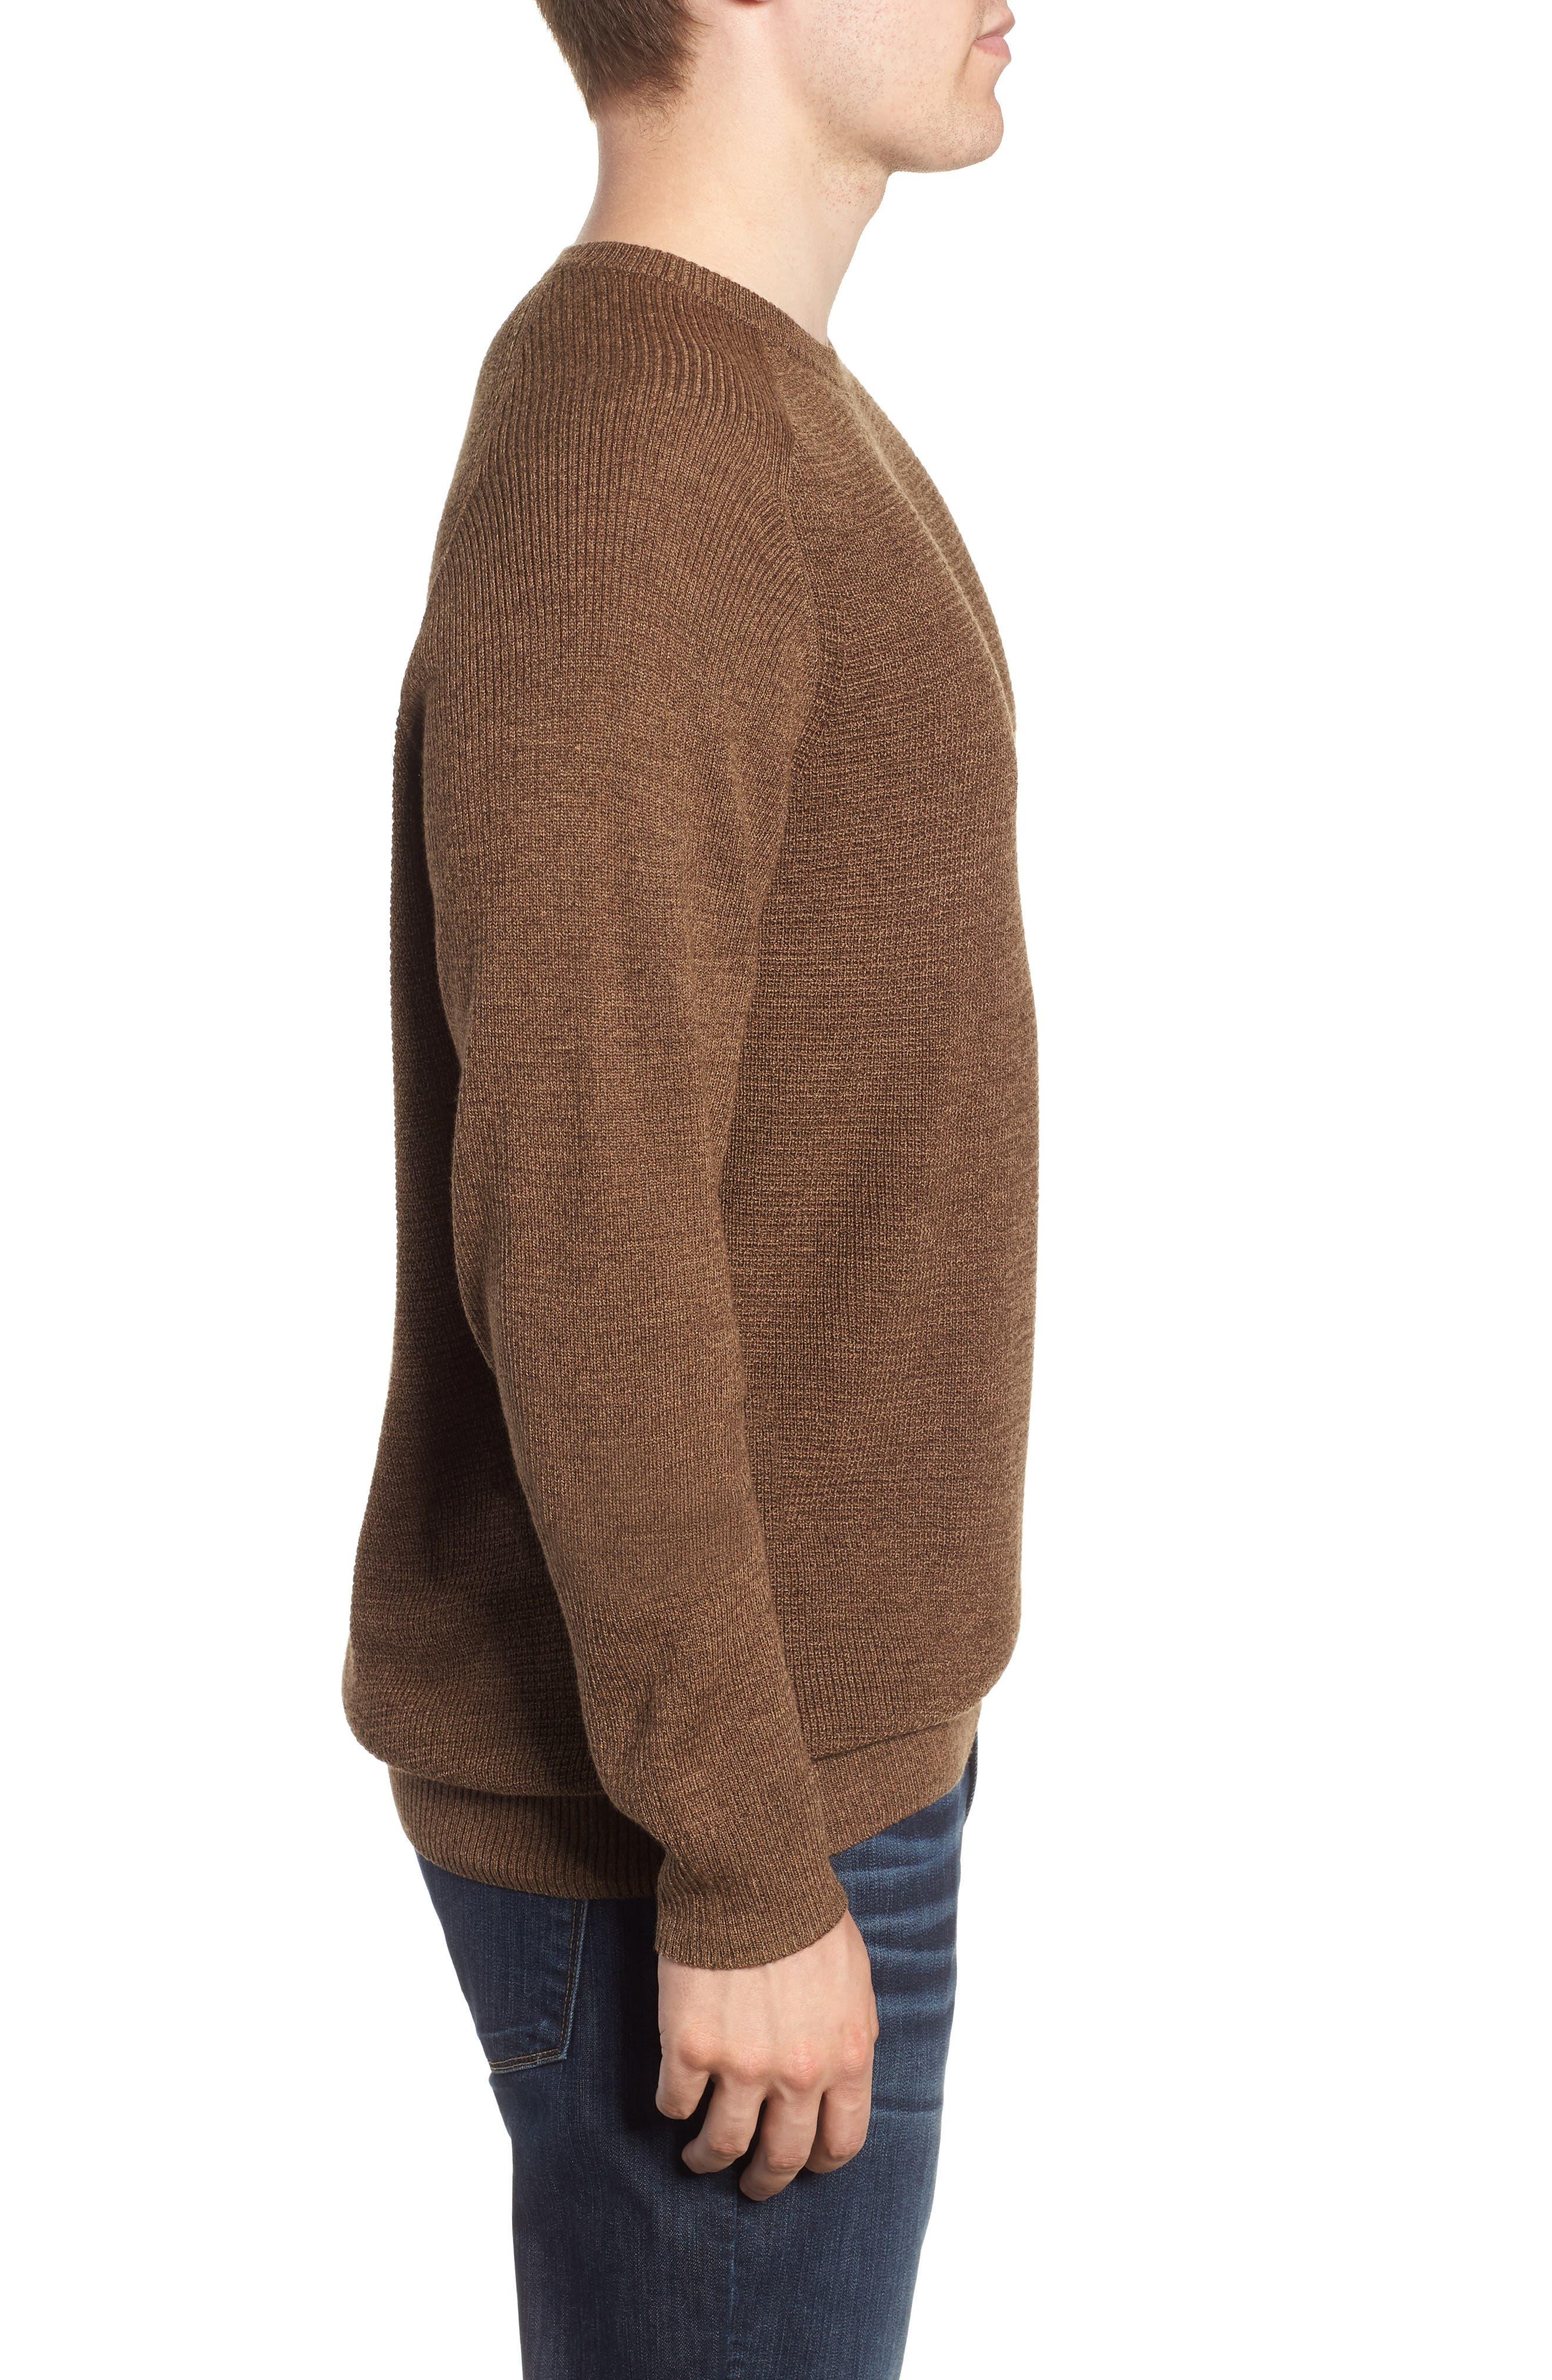 Crewneck Wool Blend Sweater,                             Alternate thumbnail 3, color,                             BROWN MAJOR